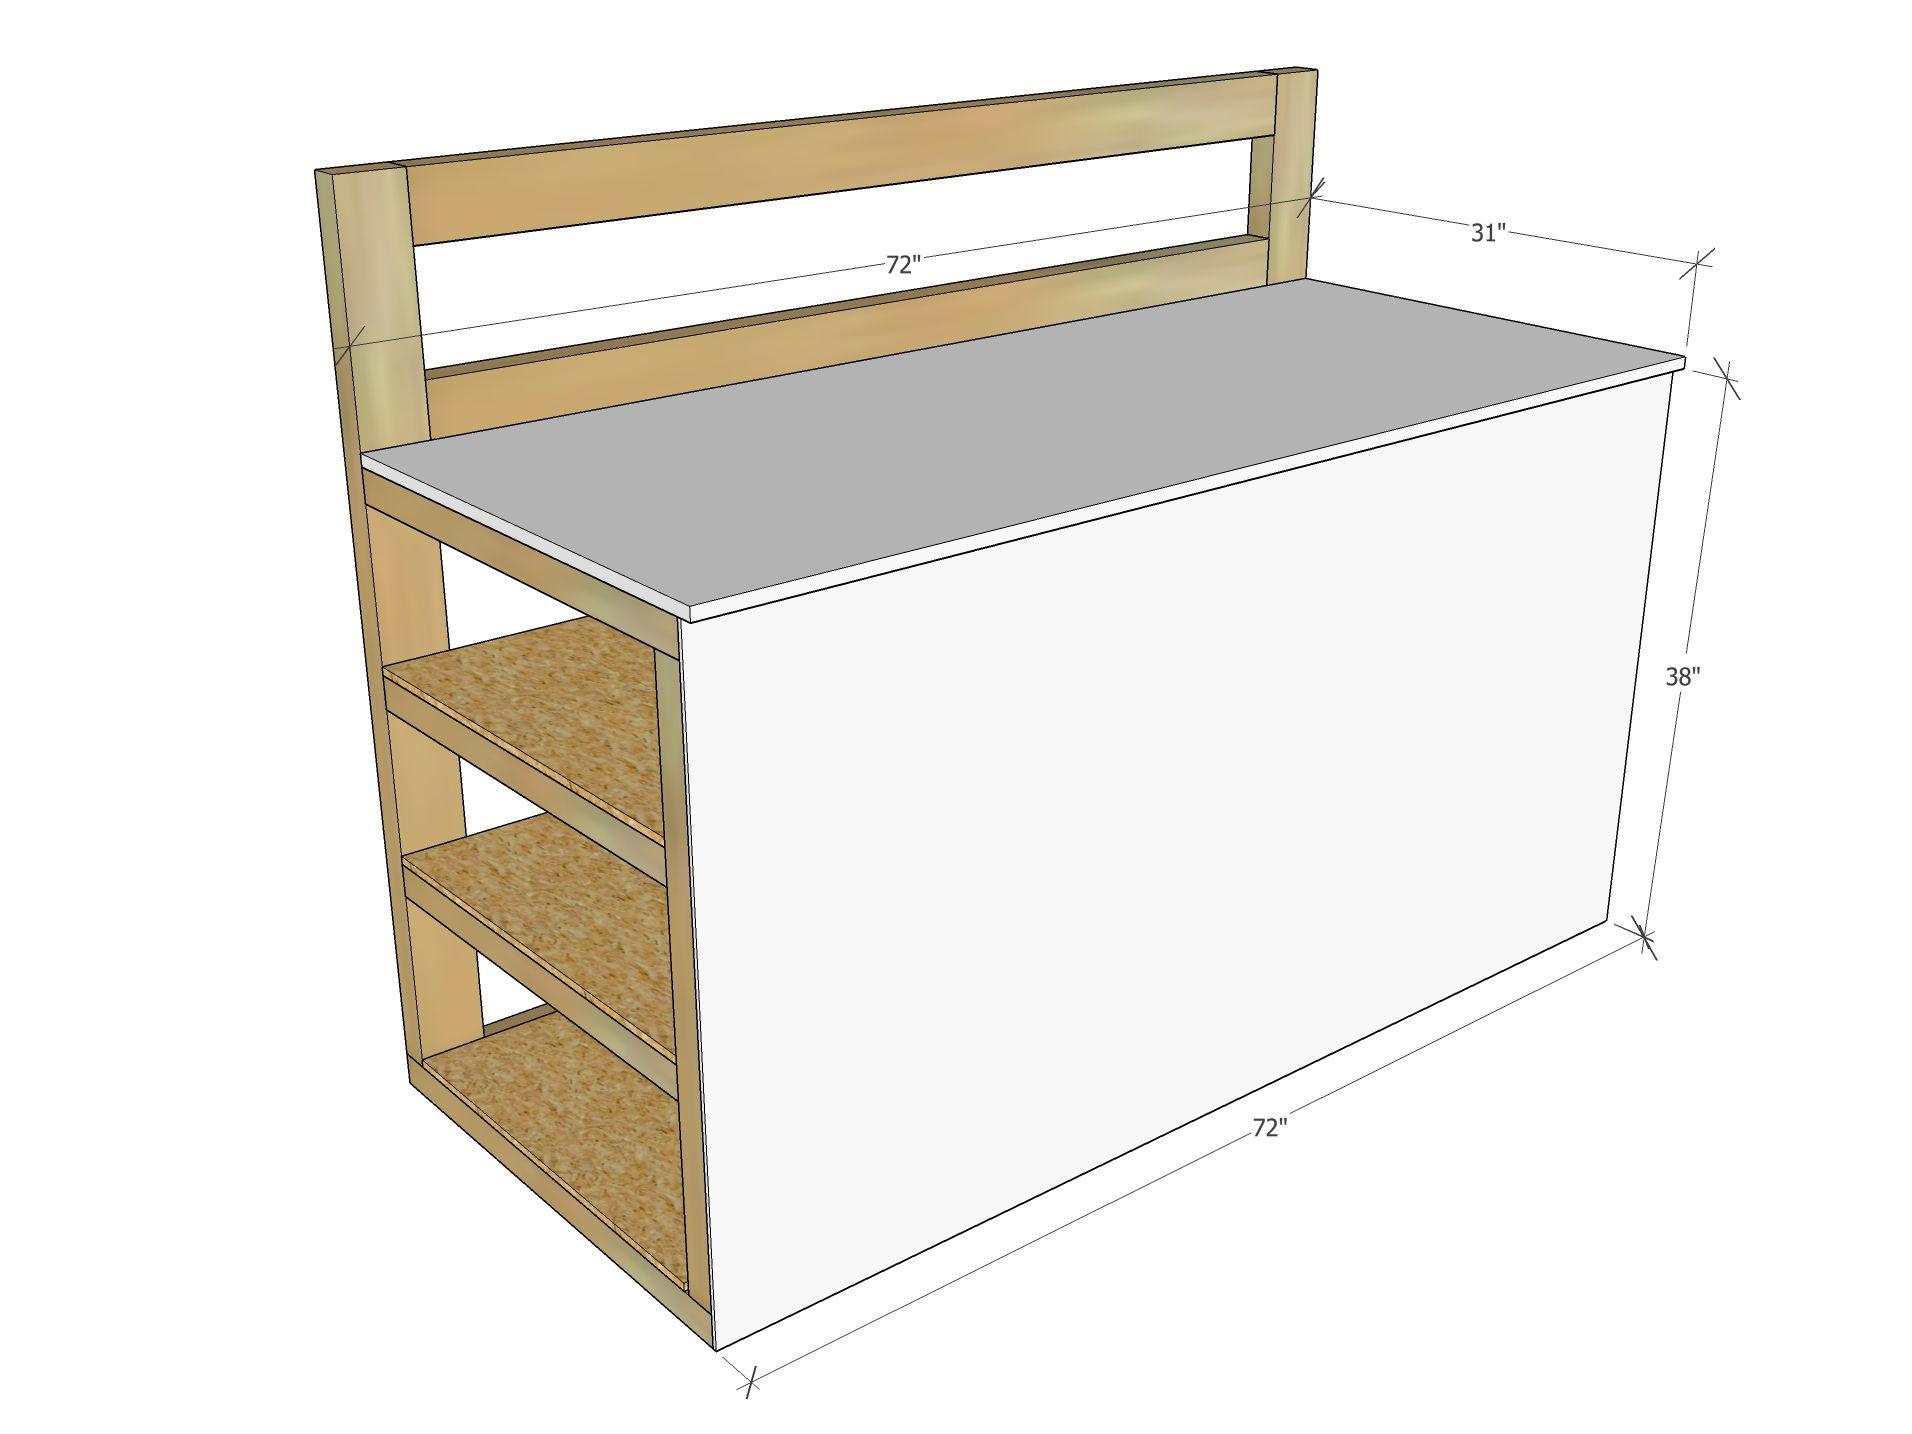 Tall Workbench with Wood Storage Wood storage, Furniture